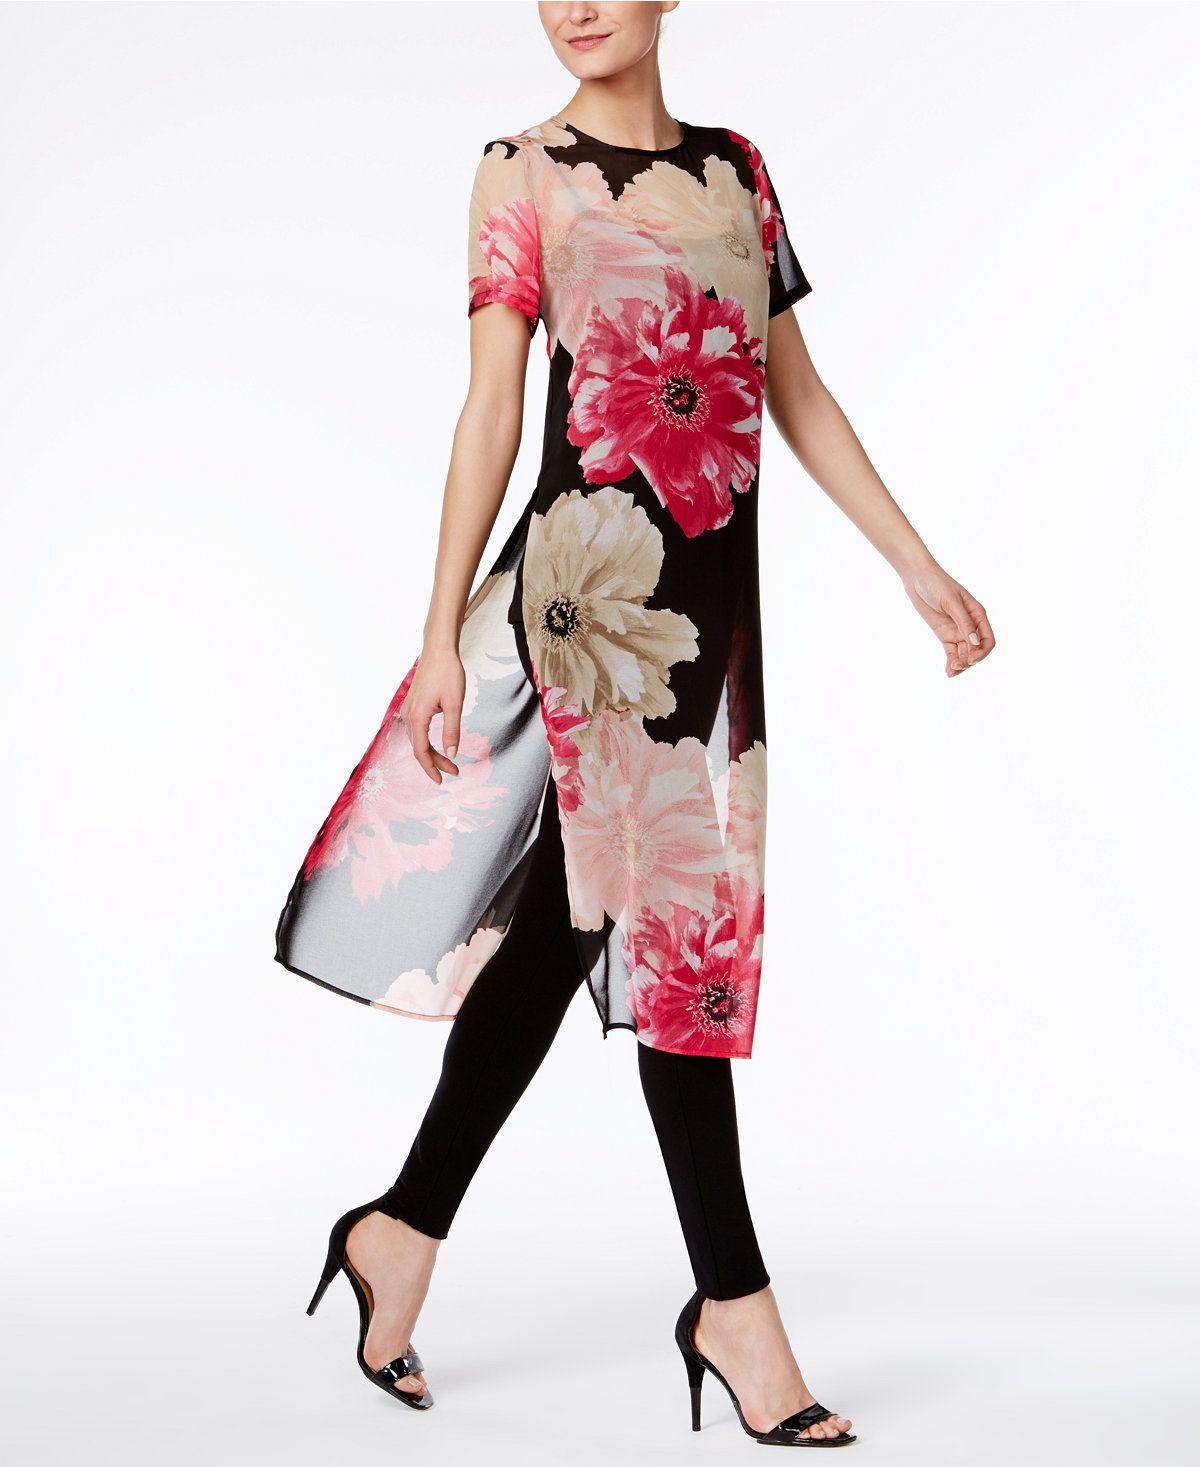 700ea4128 Calvin Klein Sheer Floral-Print Tunic - Tops - Women - Macy s